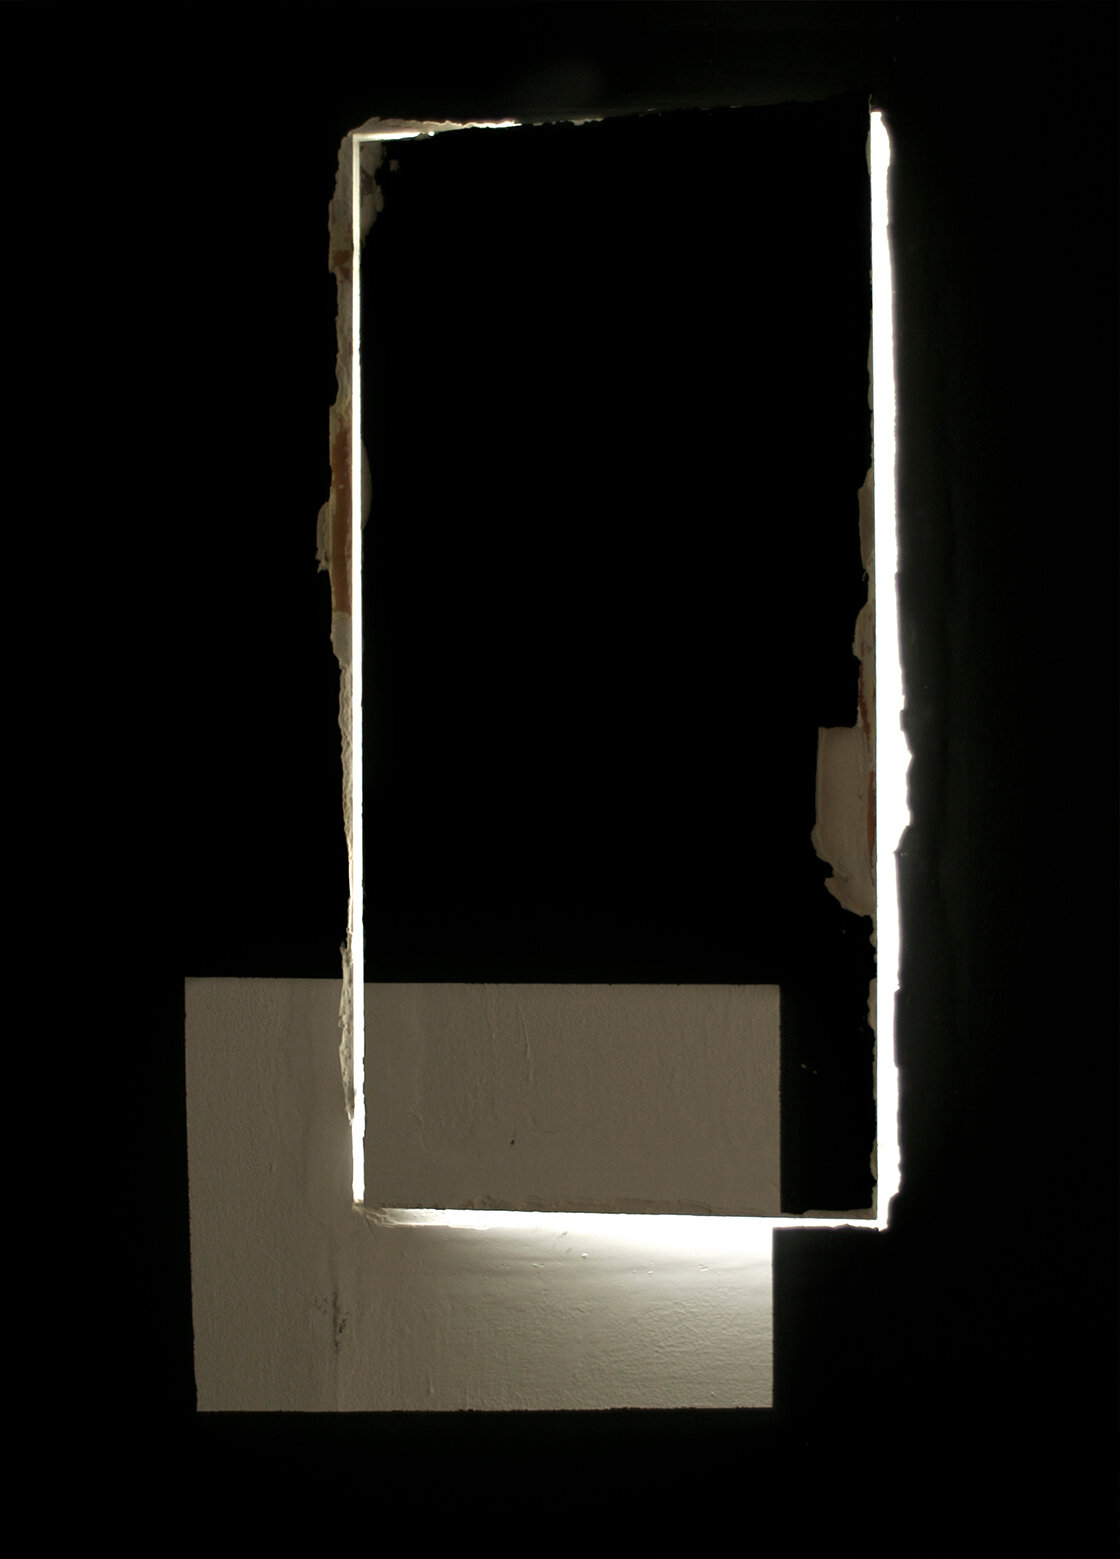 Window, 2010, archival pigment print, 70X50 cm